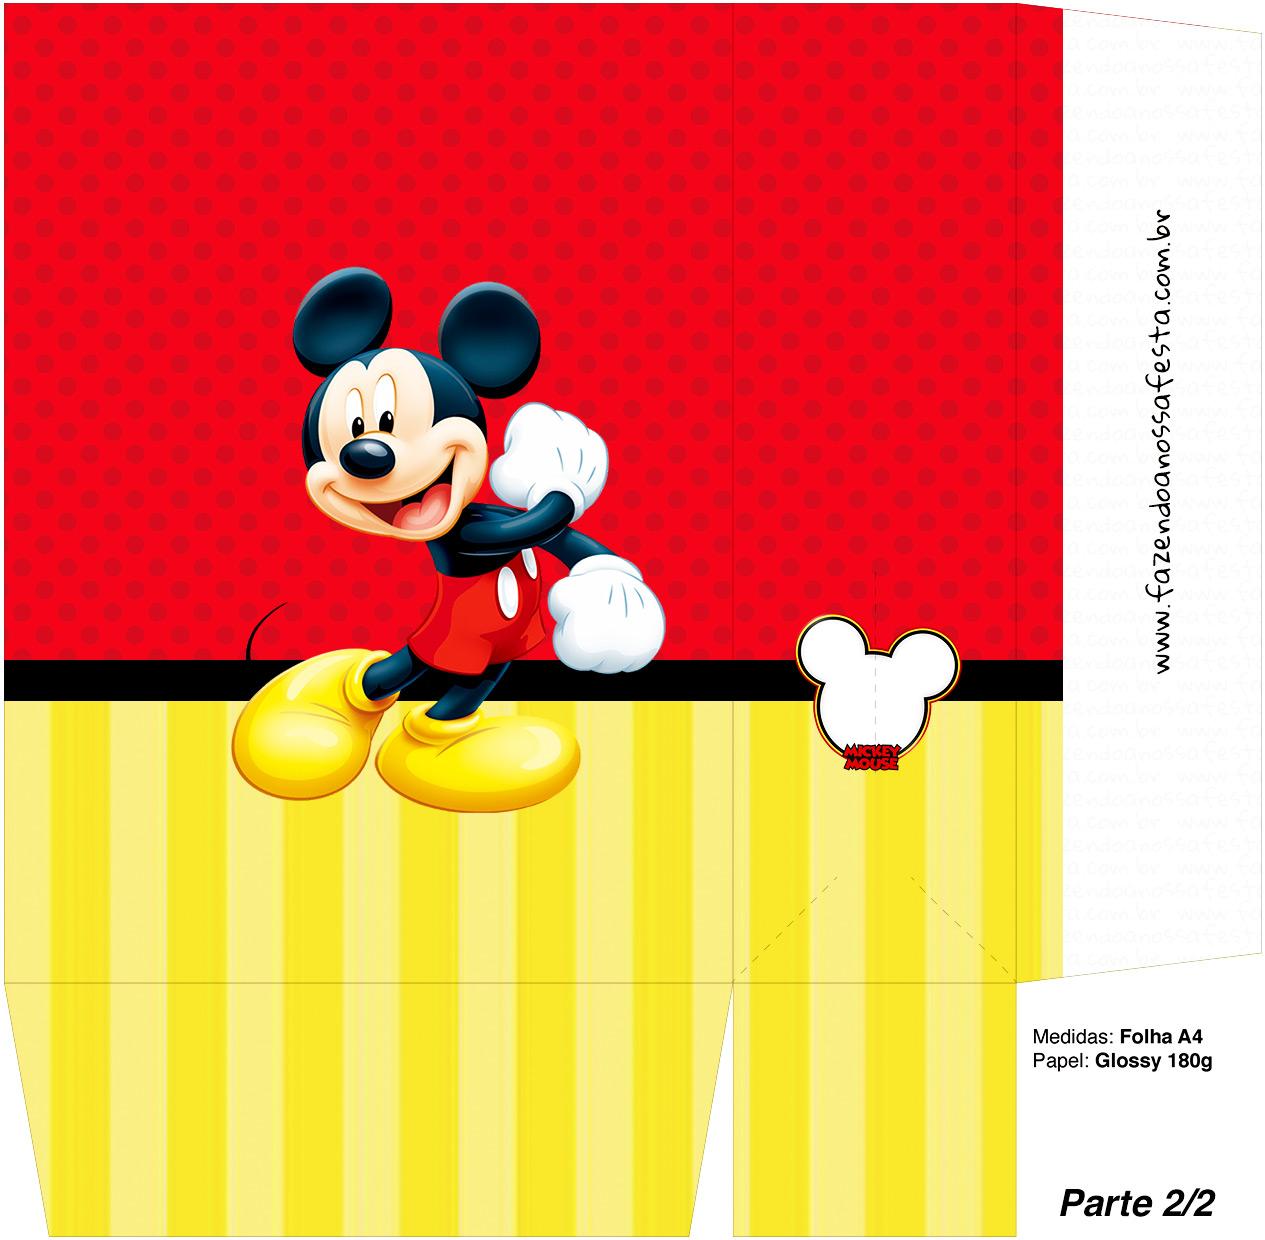 Sacolinha Lembrancinha Mickey Mouse 1 - Parte 2